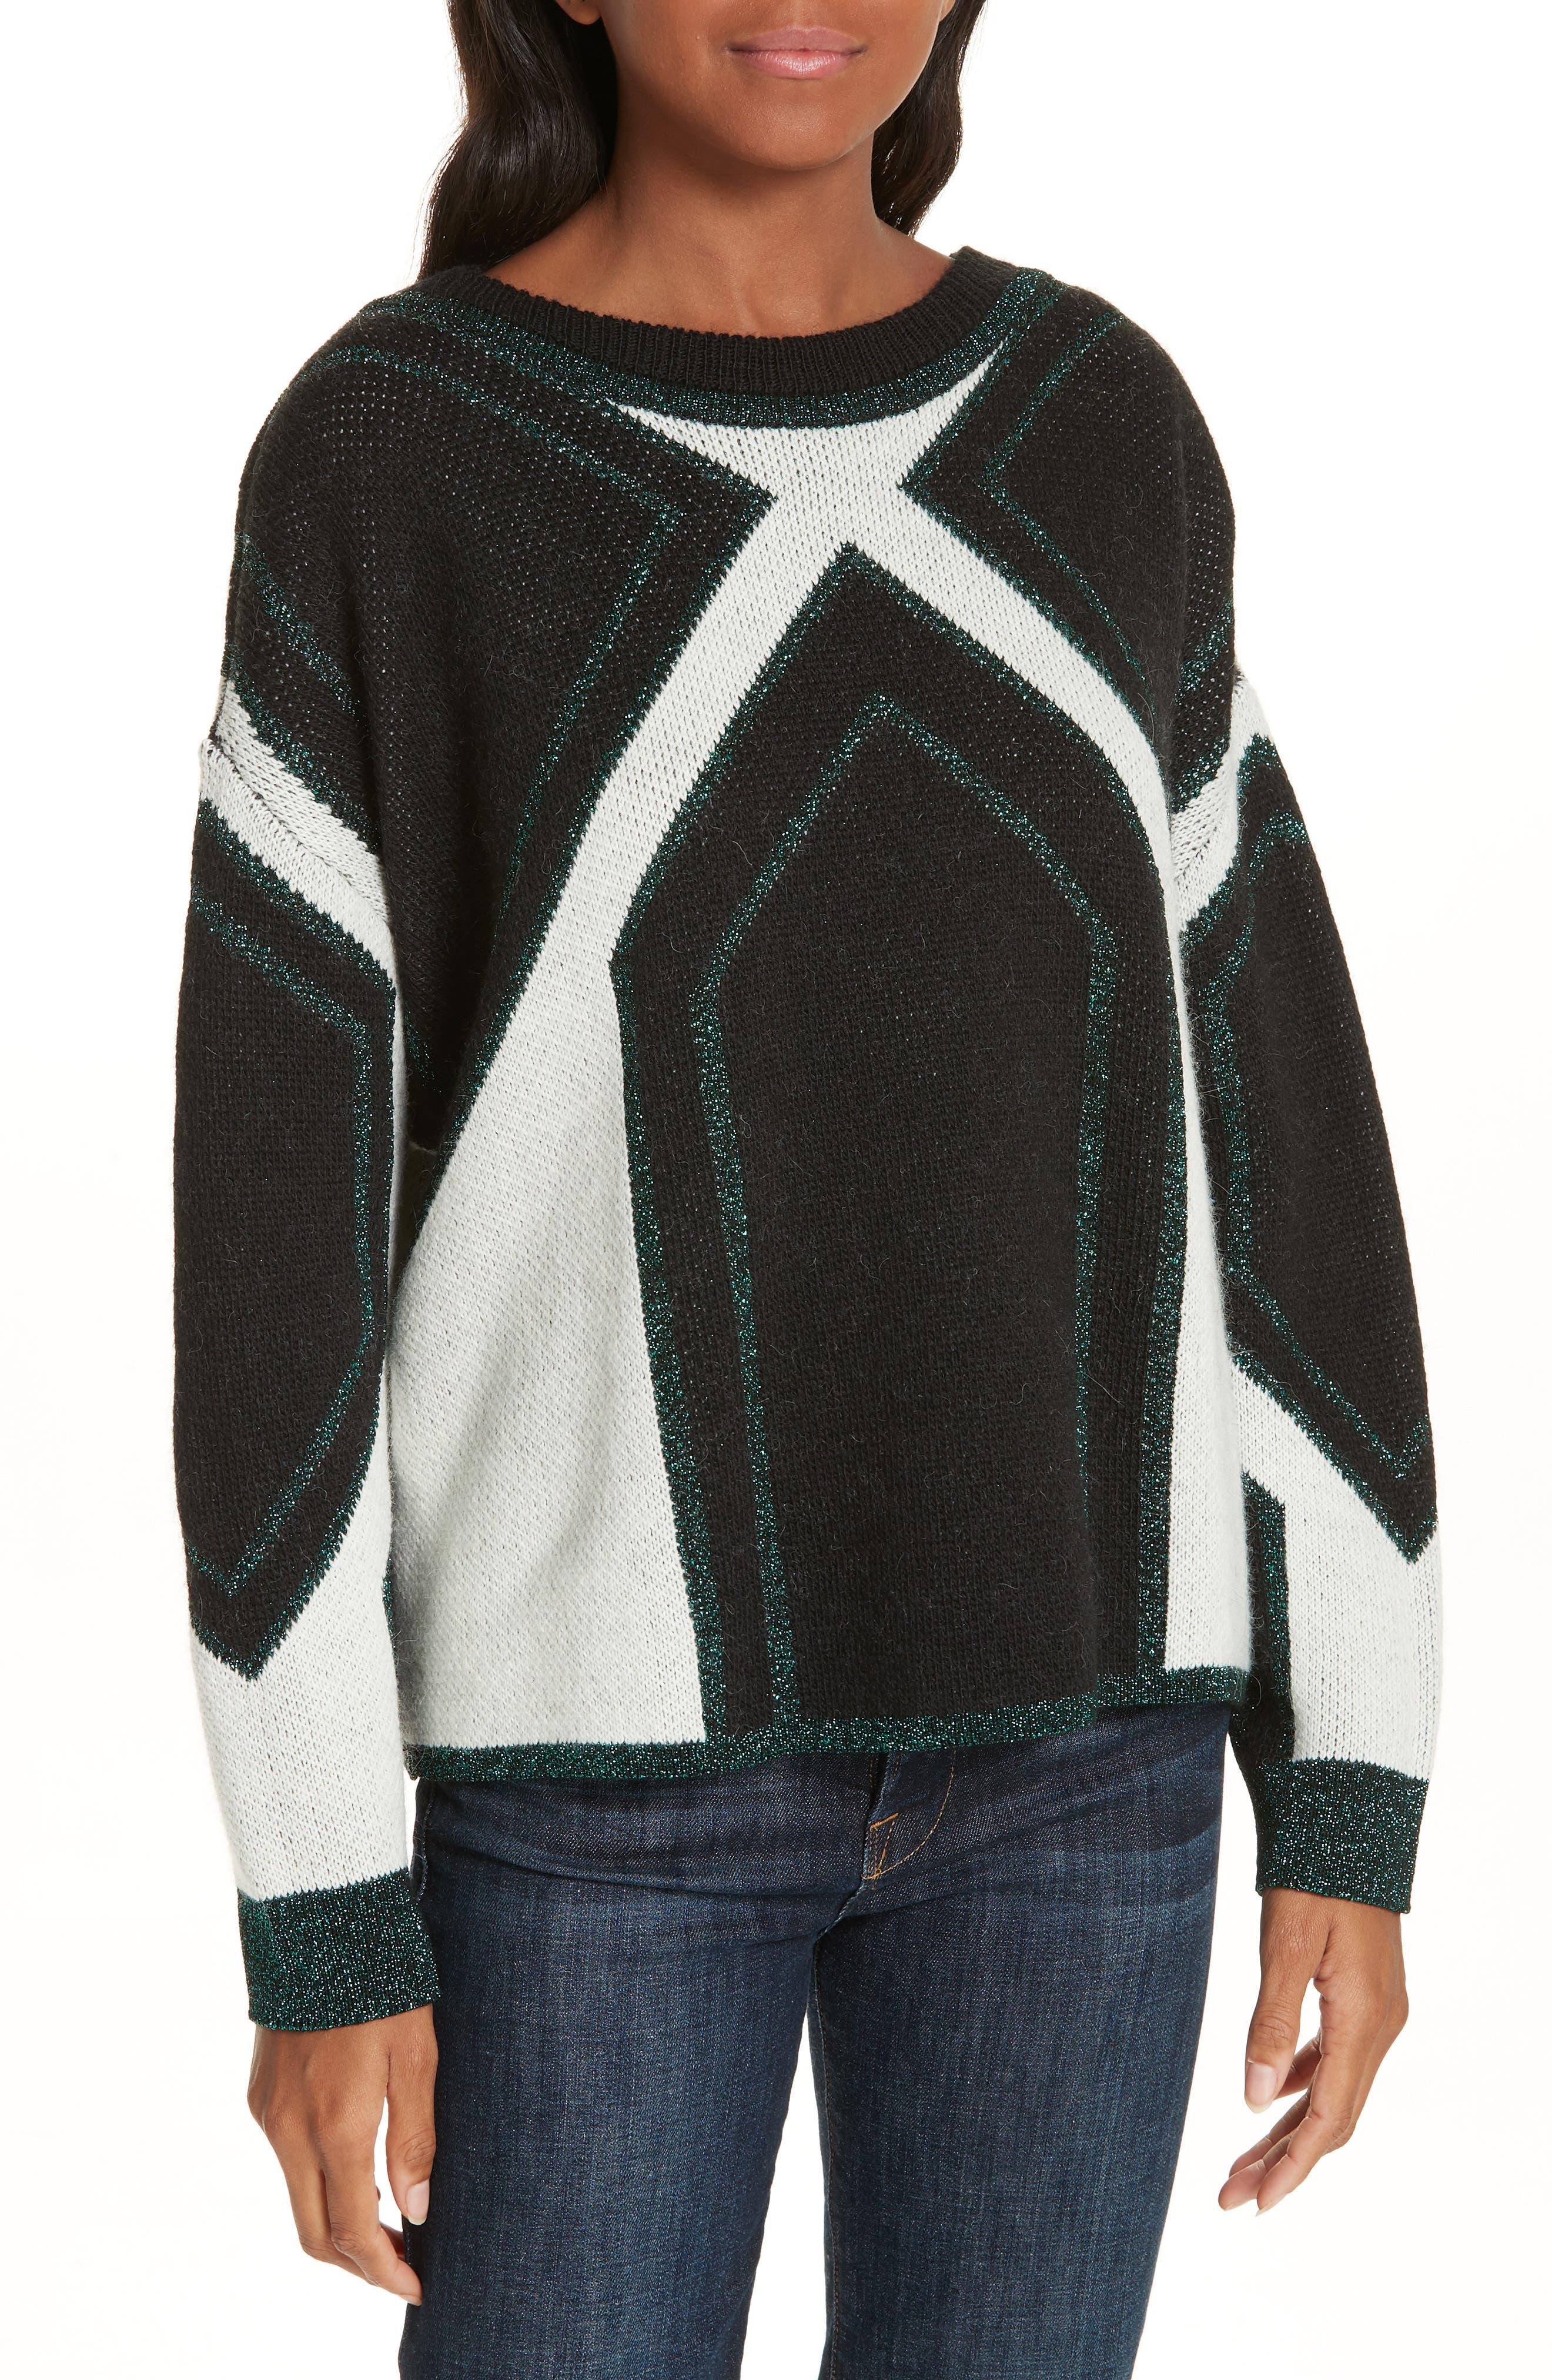 Velny Sweater,                             Main thumbnail 1, color,                             MULTI